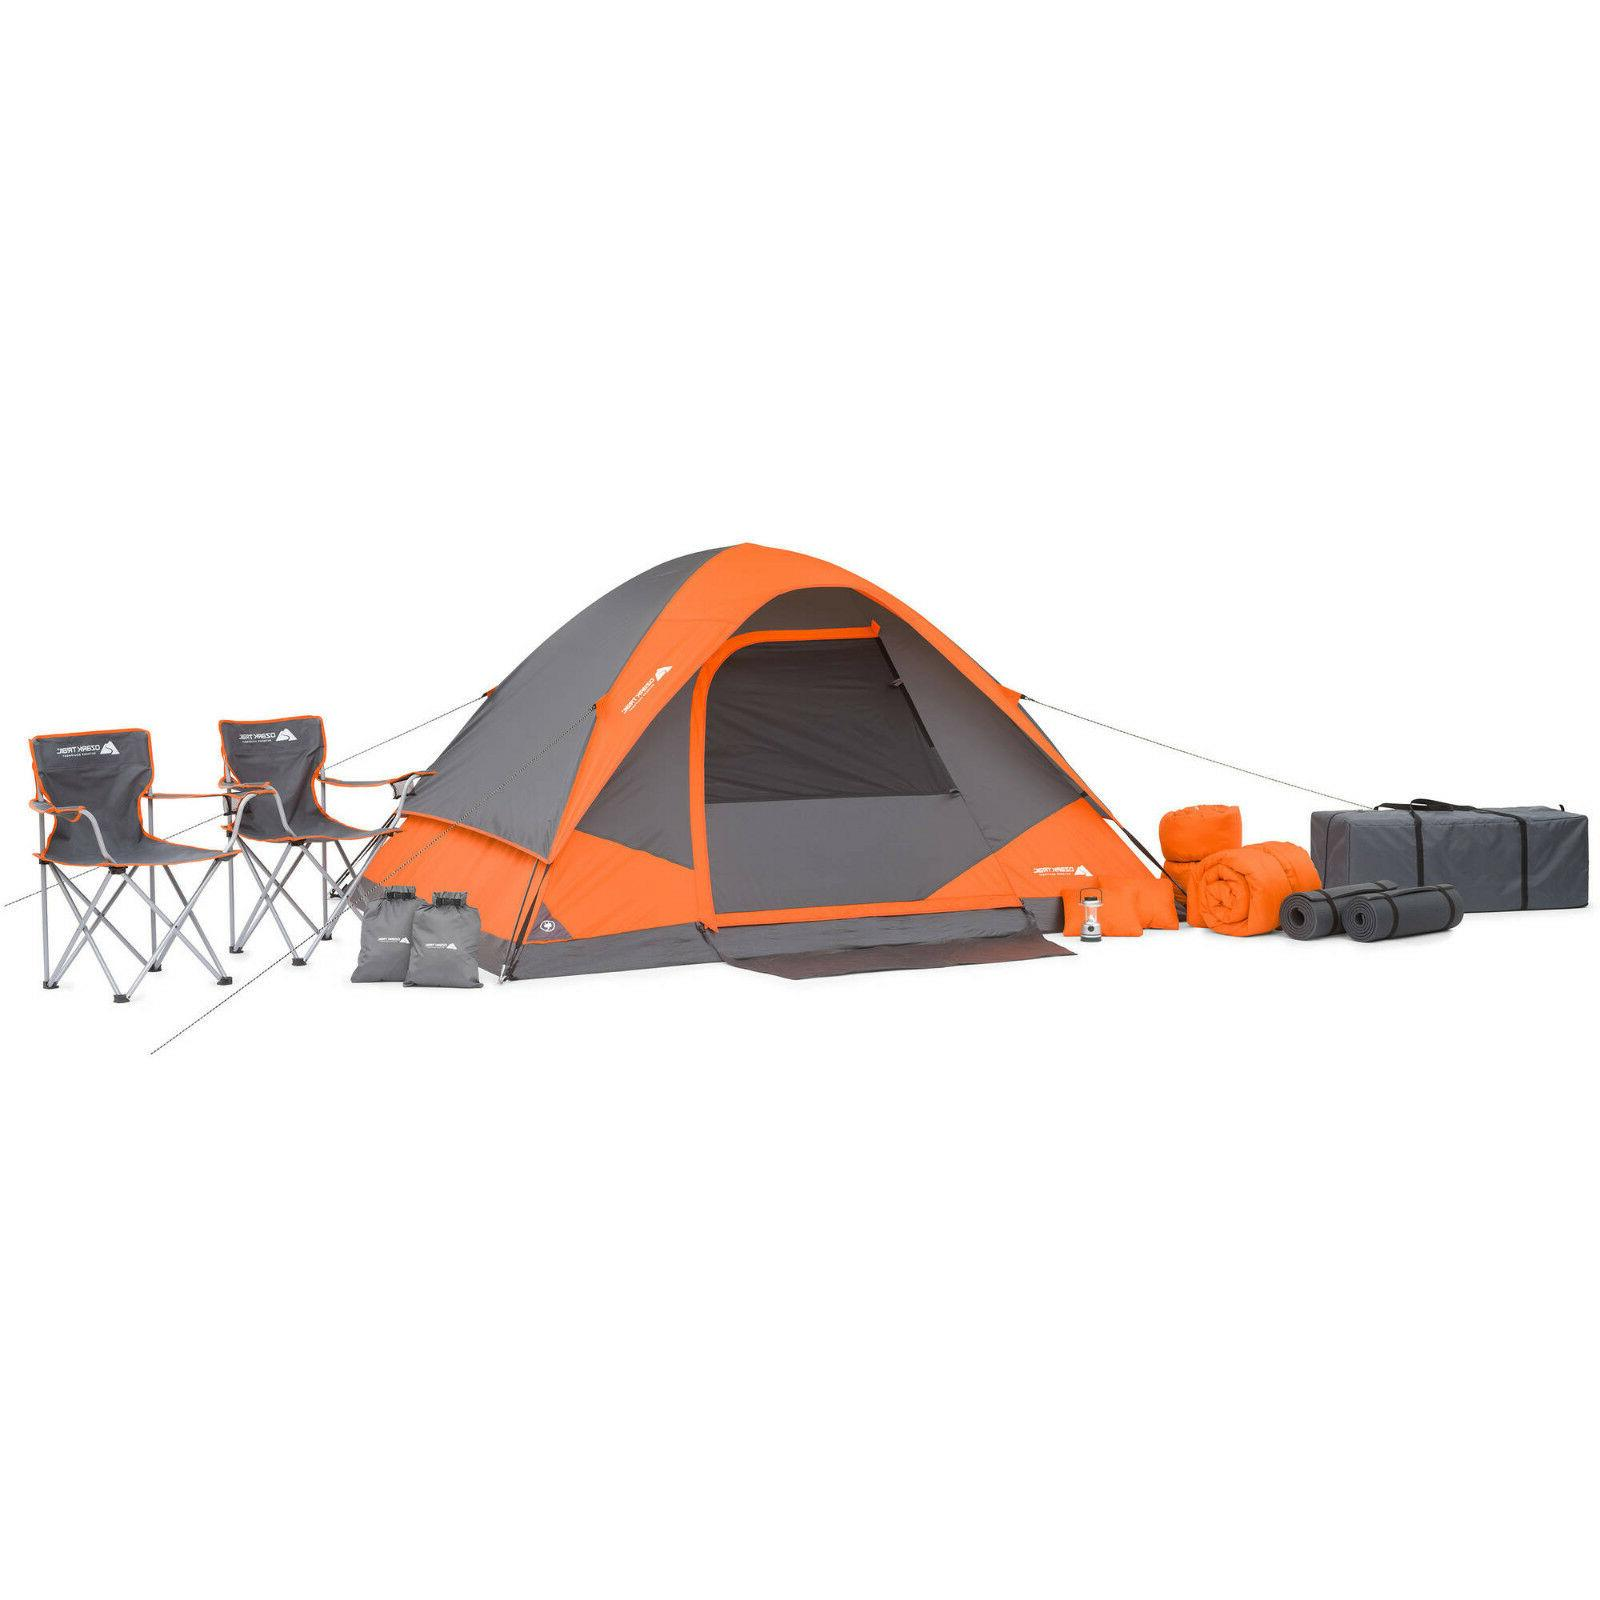 NEW Ozark Trail 22 Piece Camping Combo Set Tent Sleeping Bag